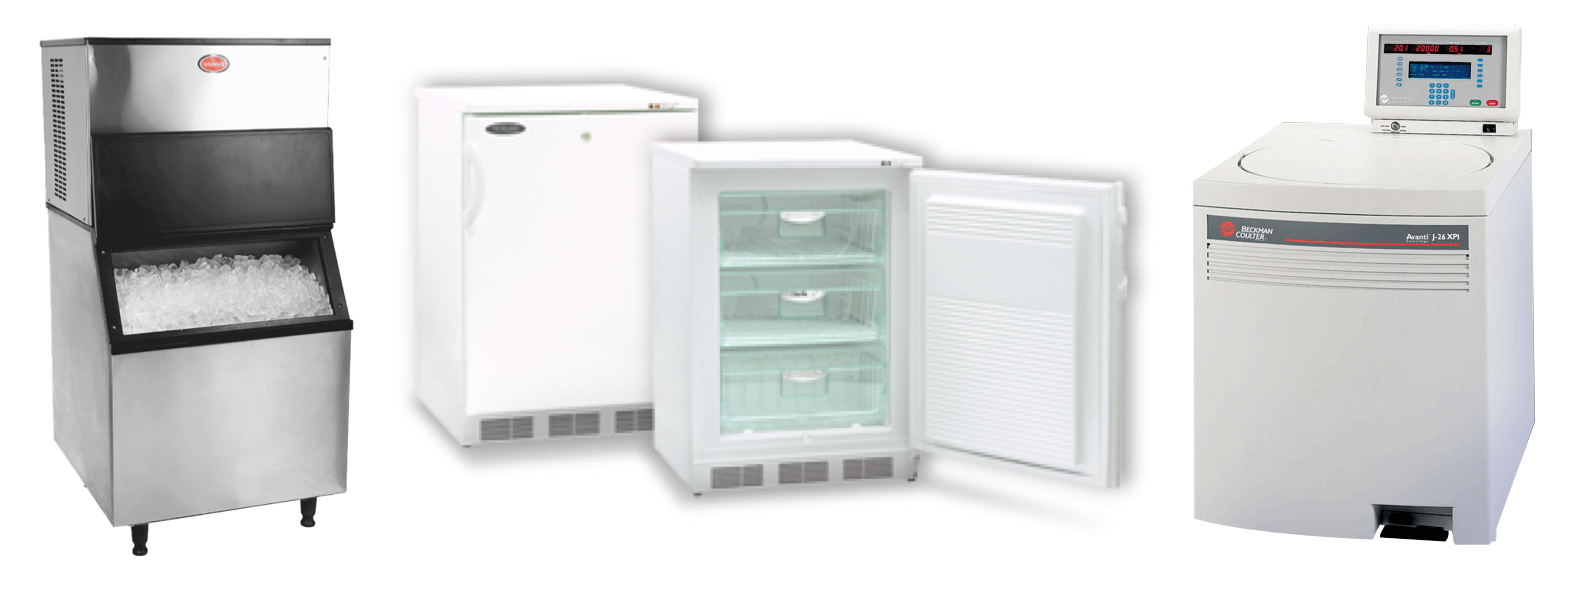 small ice machine and fridge and centrifuge